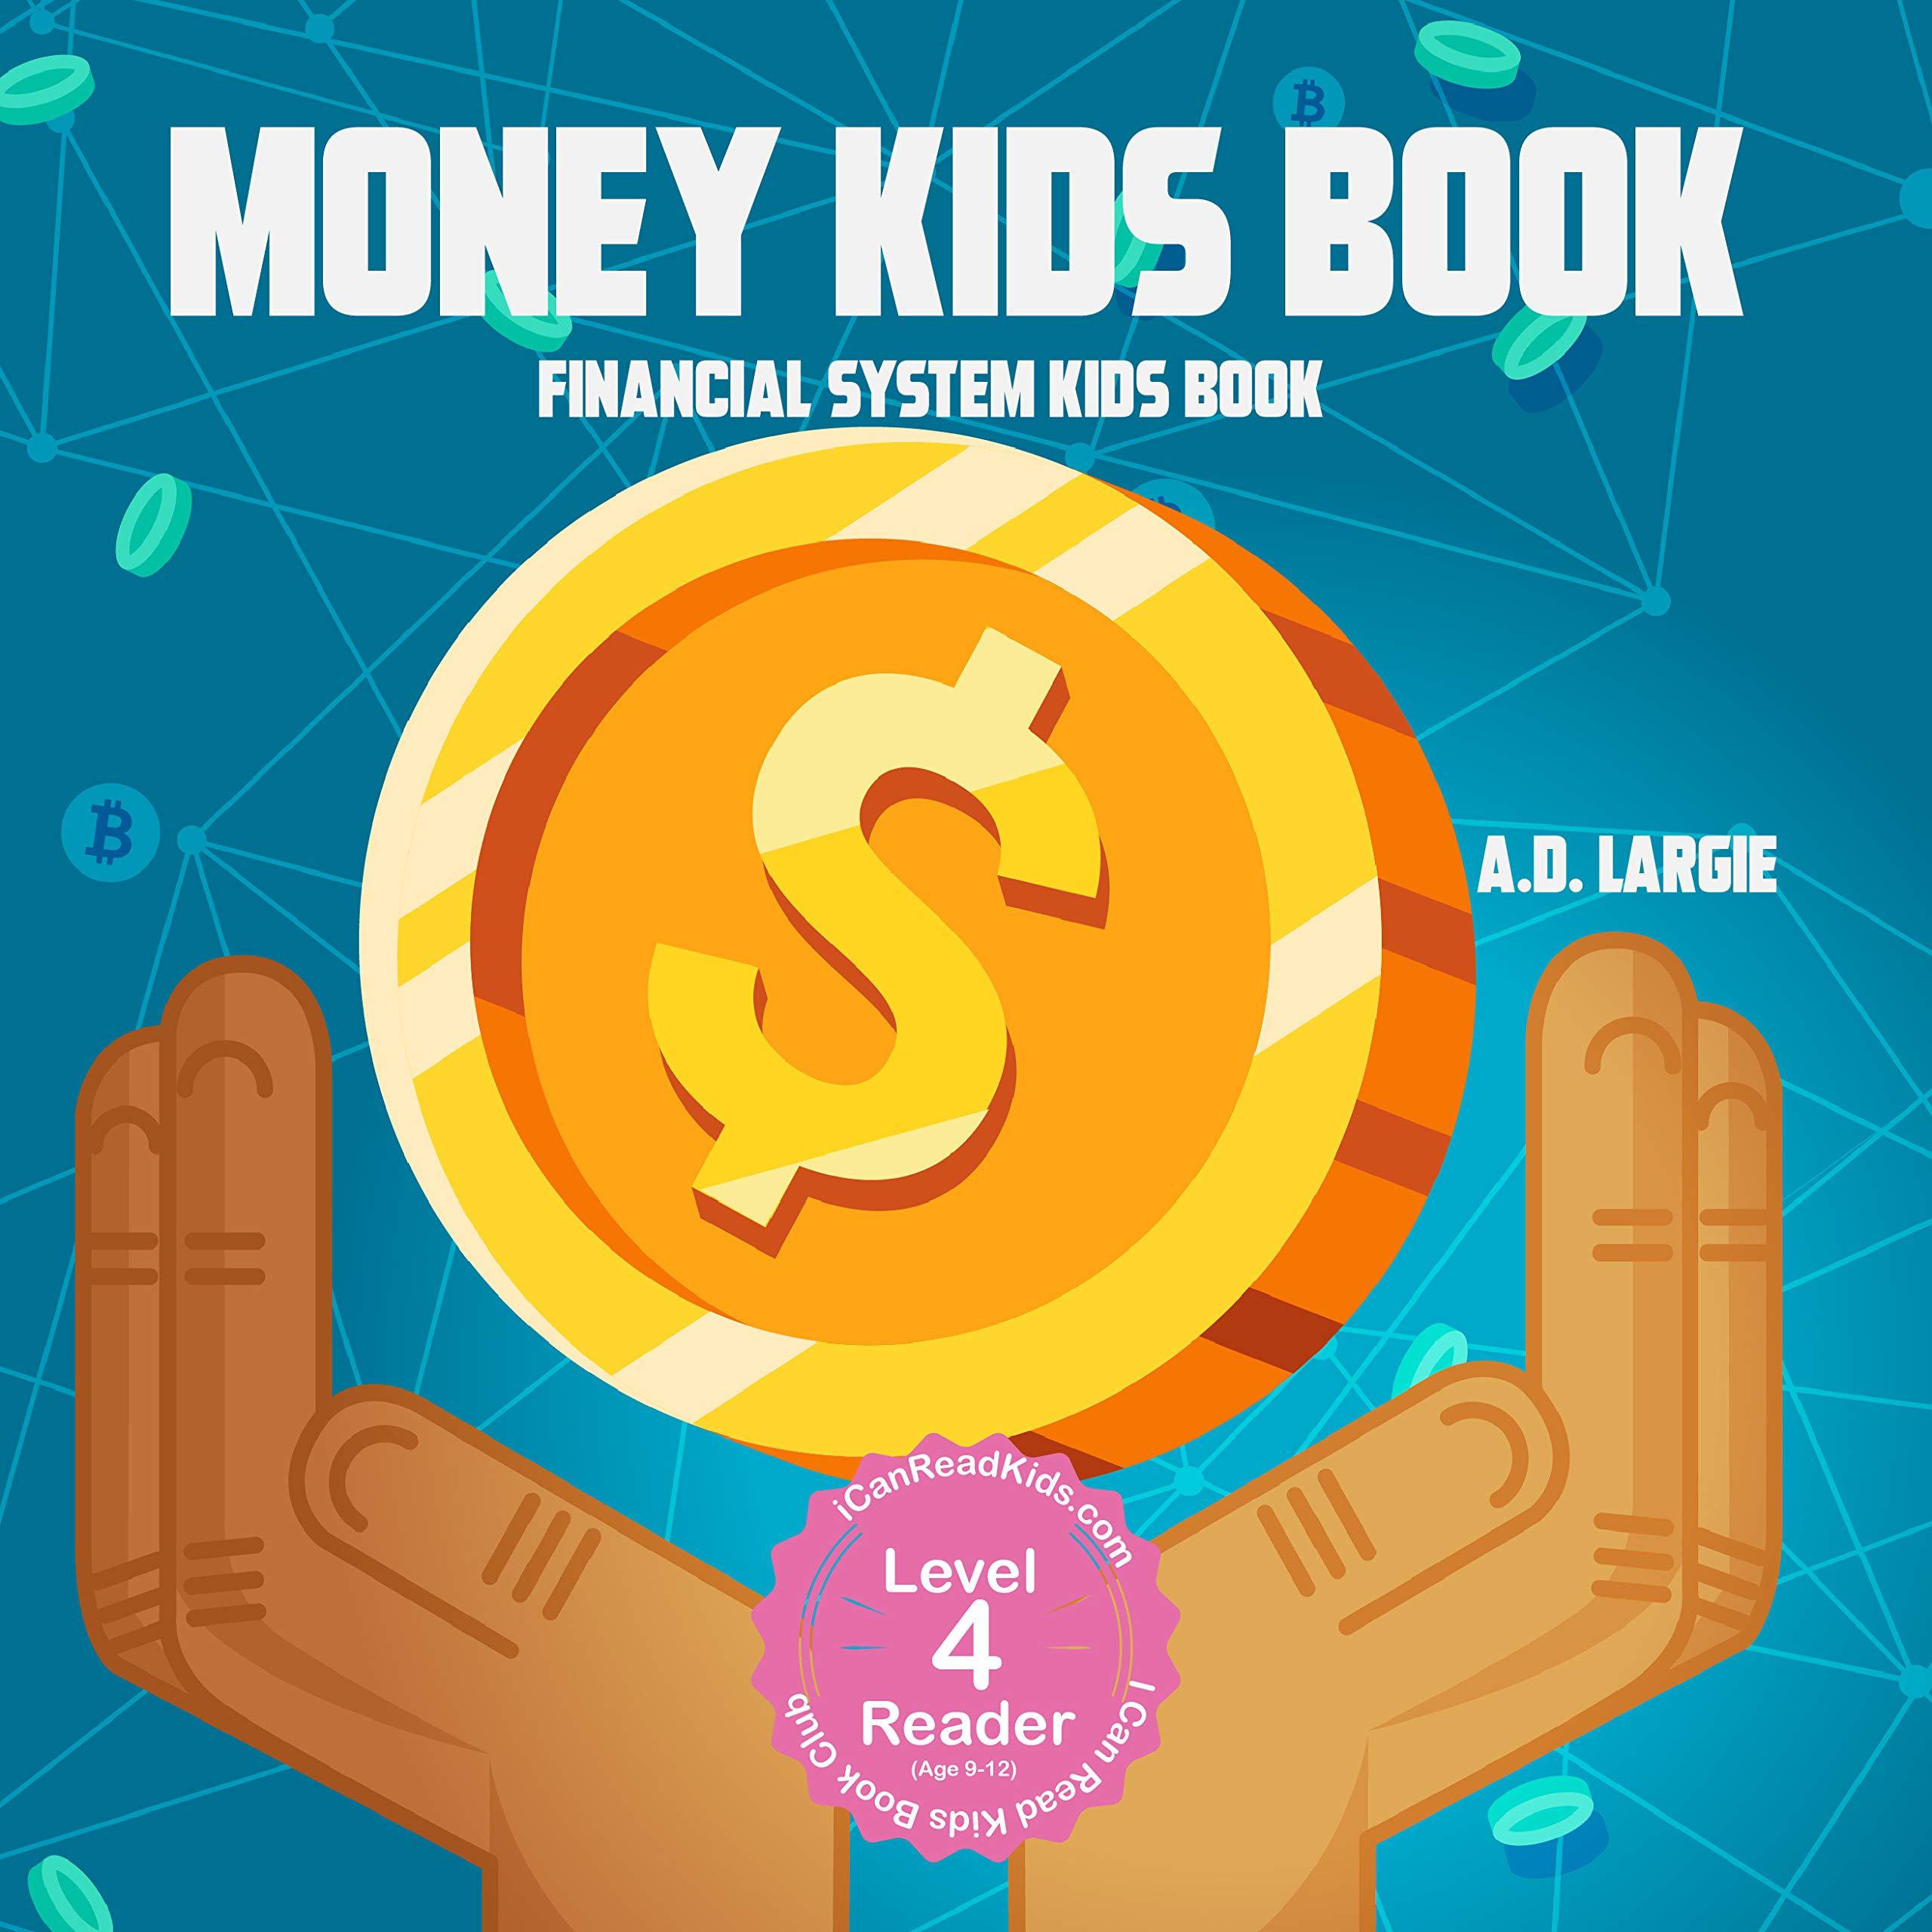 Money Kids Book: Financial System Kids Book (Books For Kids 9-12 1)